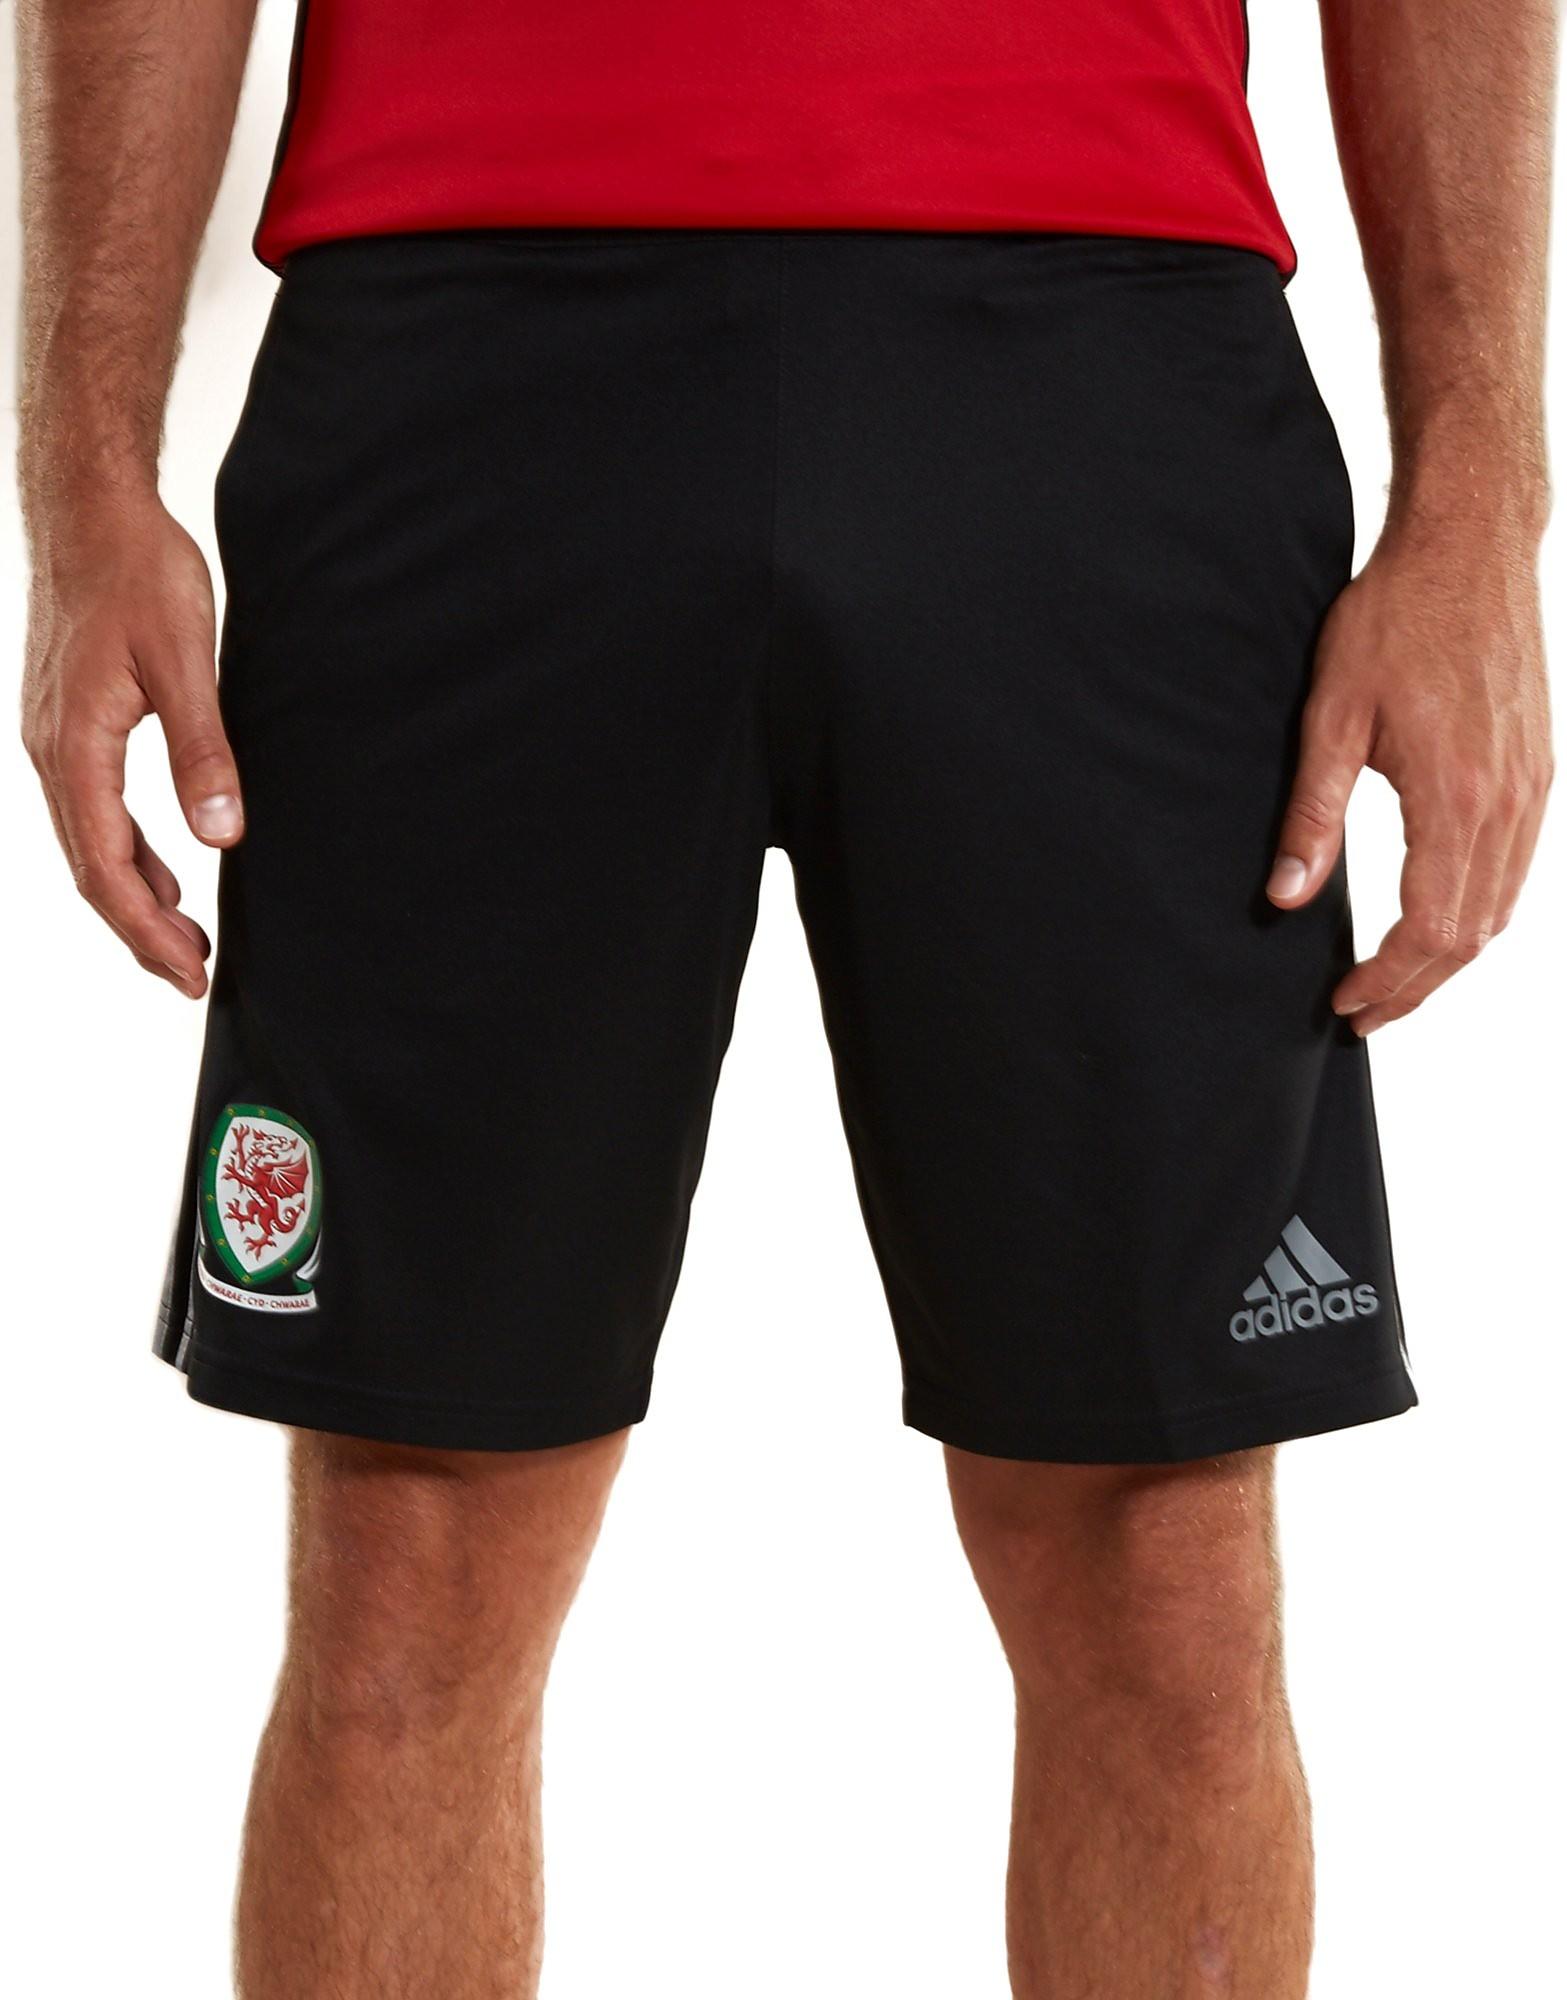 adidas Wales 2016/17 Training Shorts